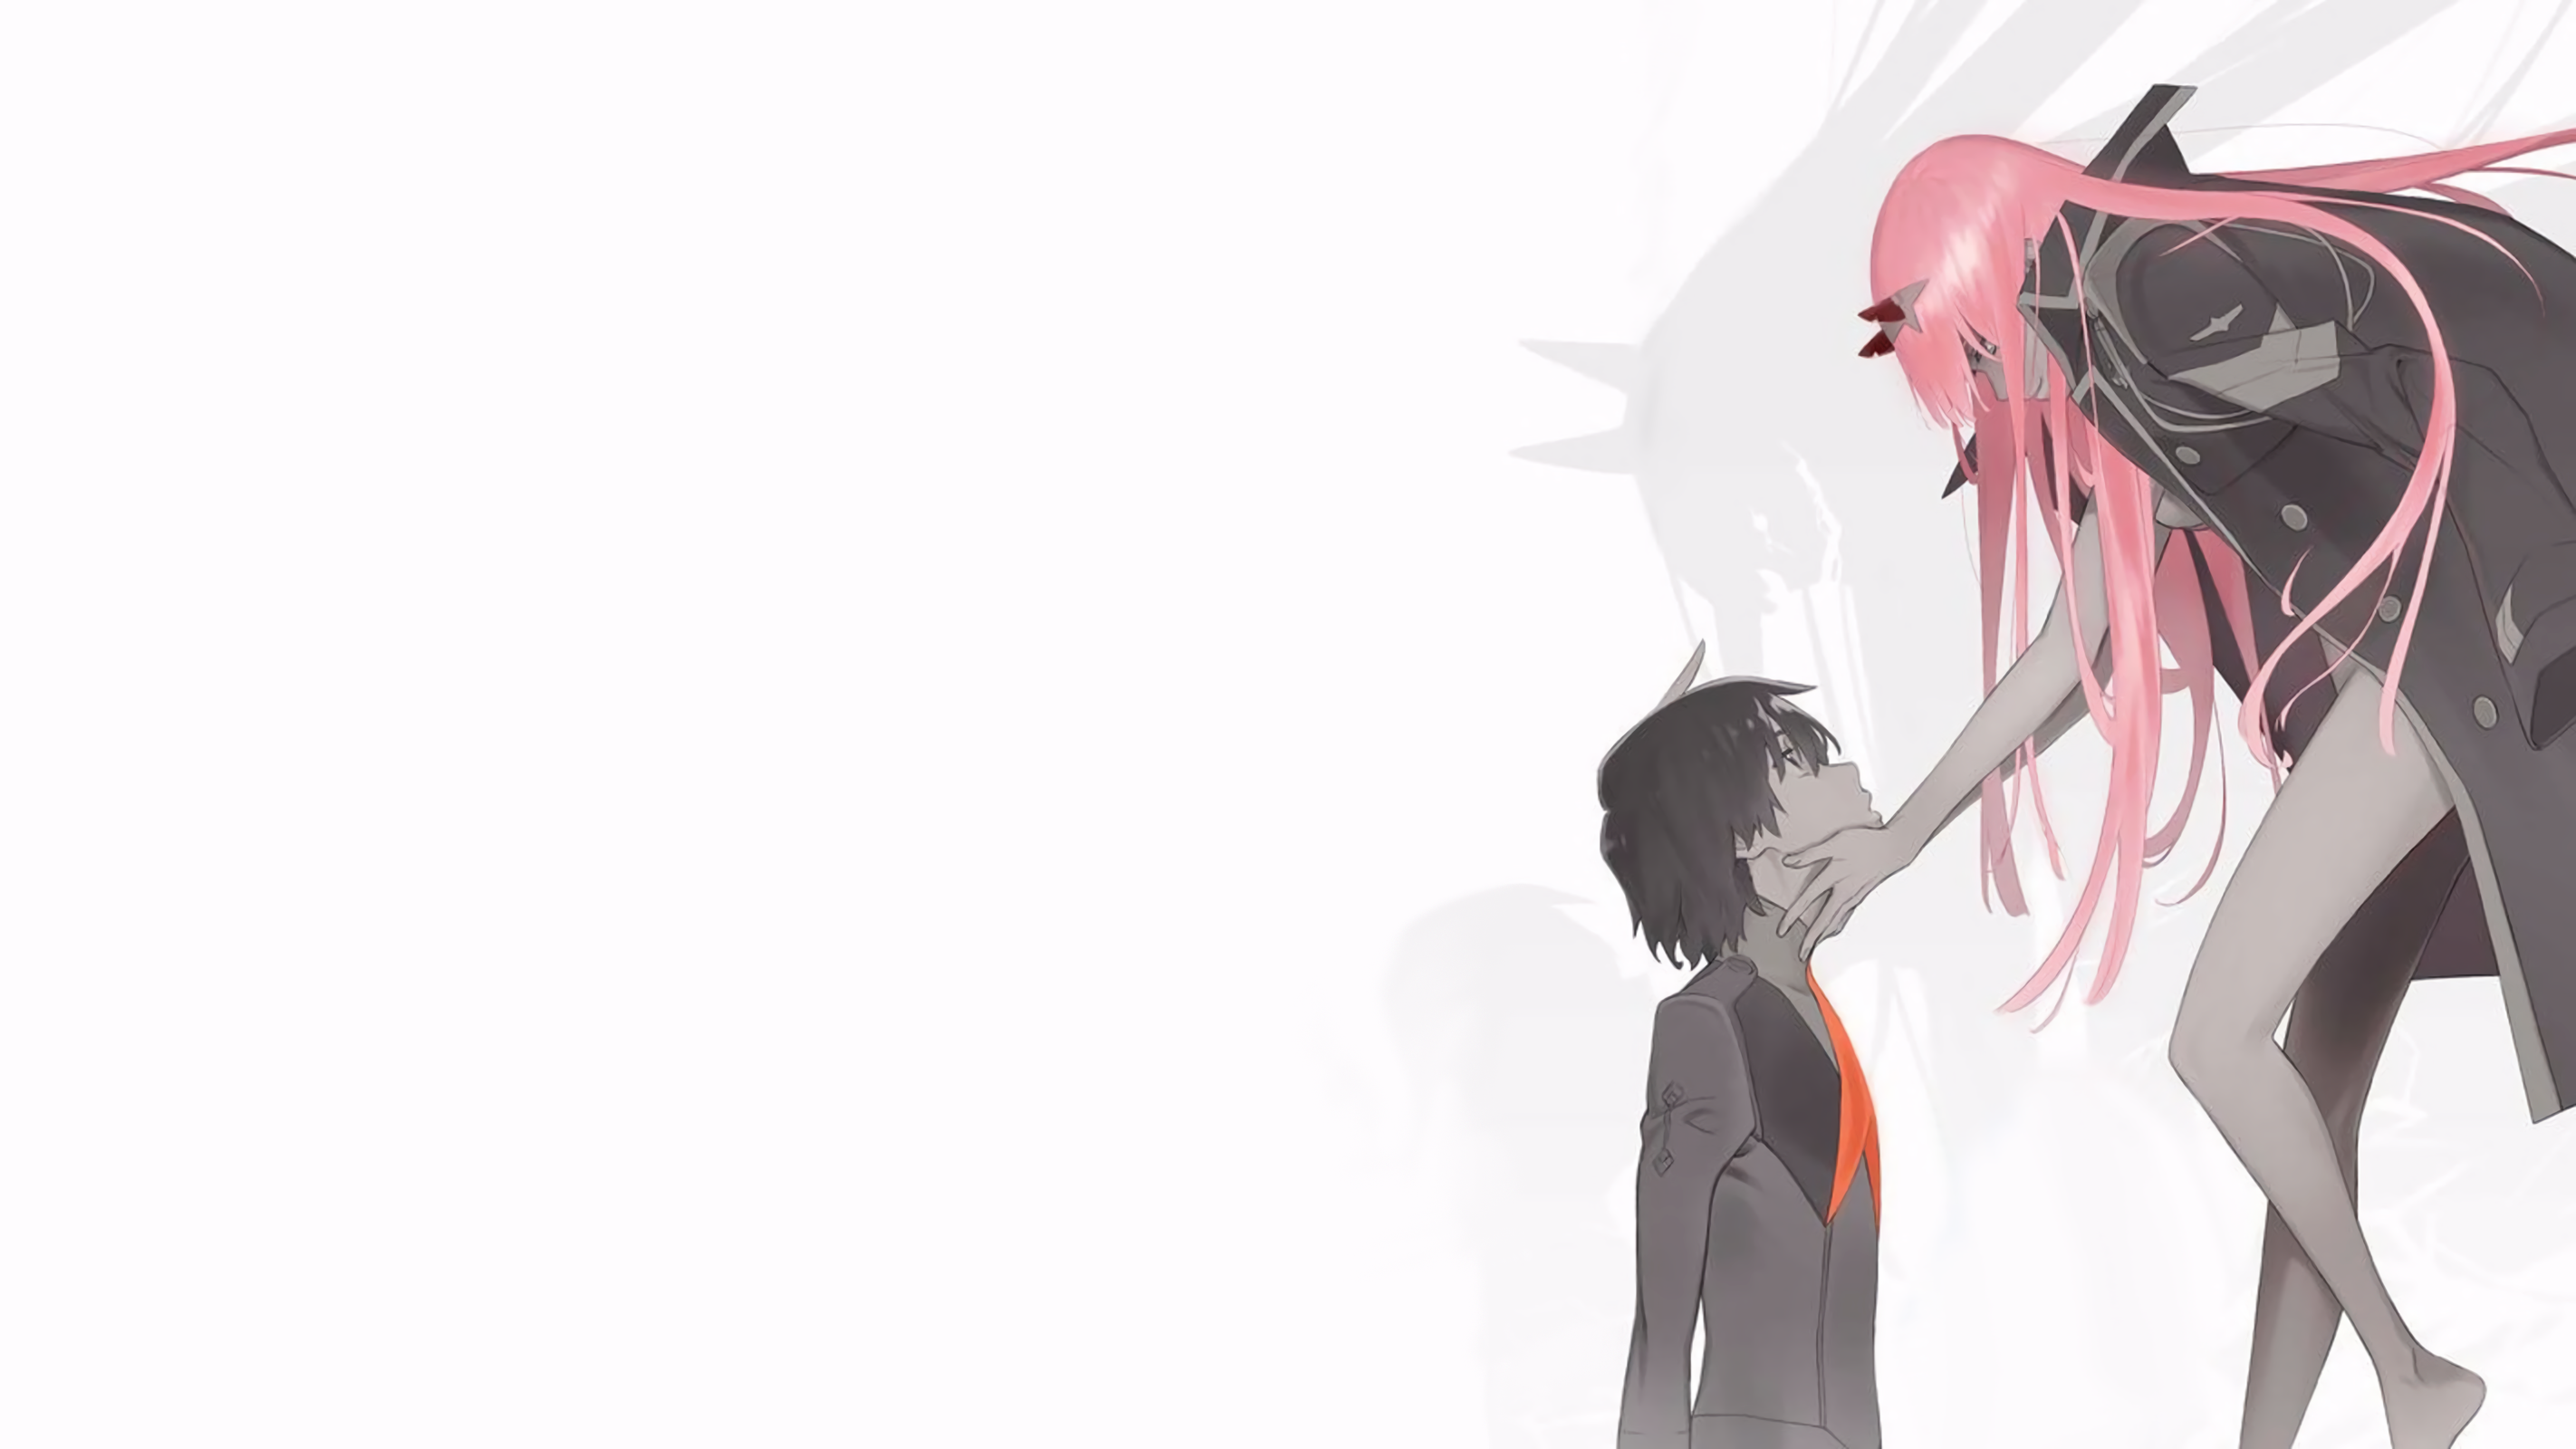 Anime 2844x1600 Digital Art Artwork Long Hair Anime Anime Girls Pink Hair Darling In The Franxx Code 016 Hiro Code 002 02 Thighs Horned Horns Anime Boys Si